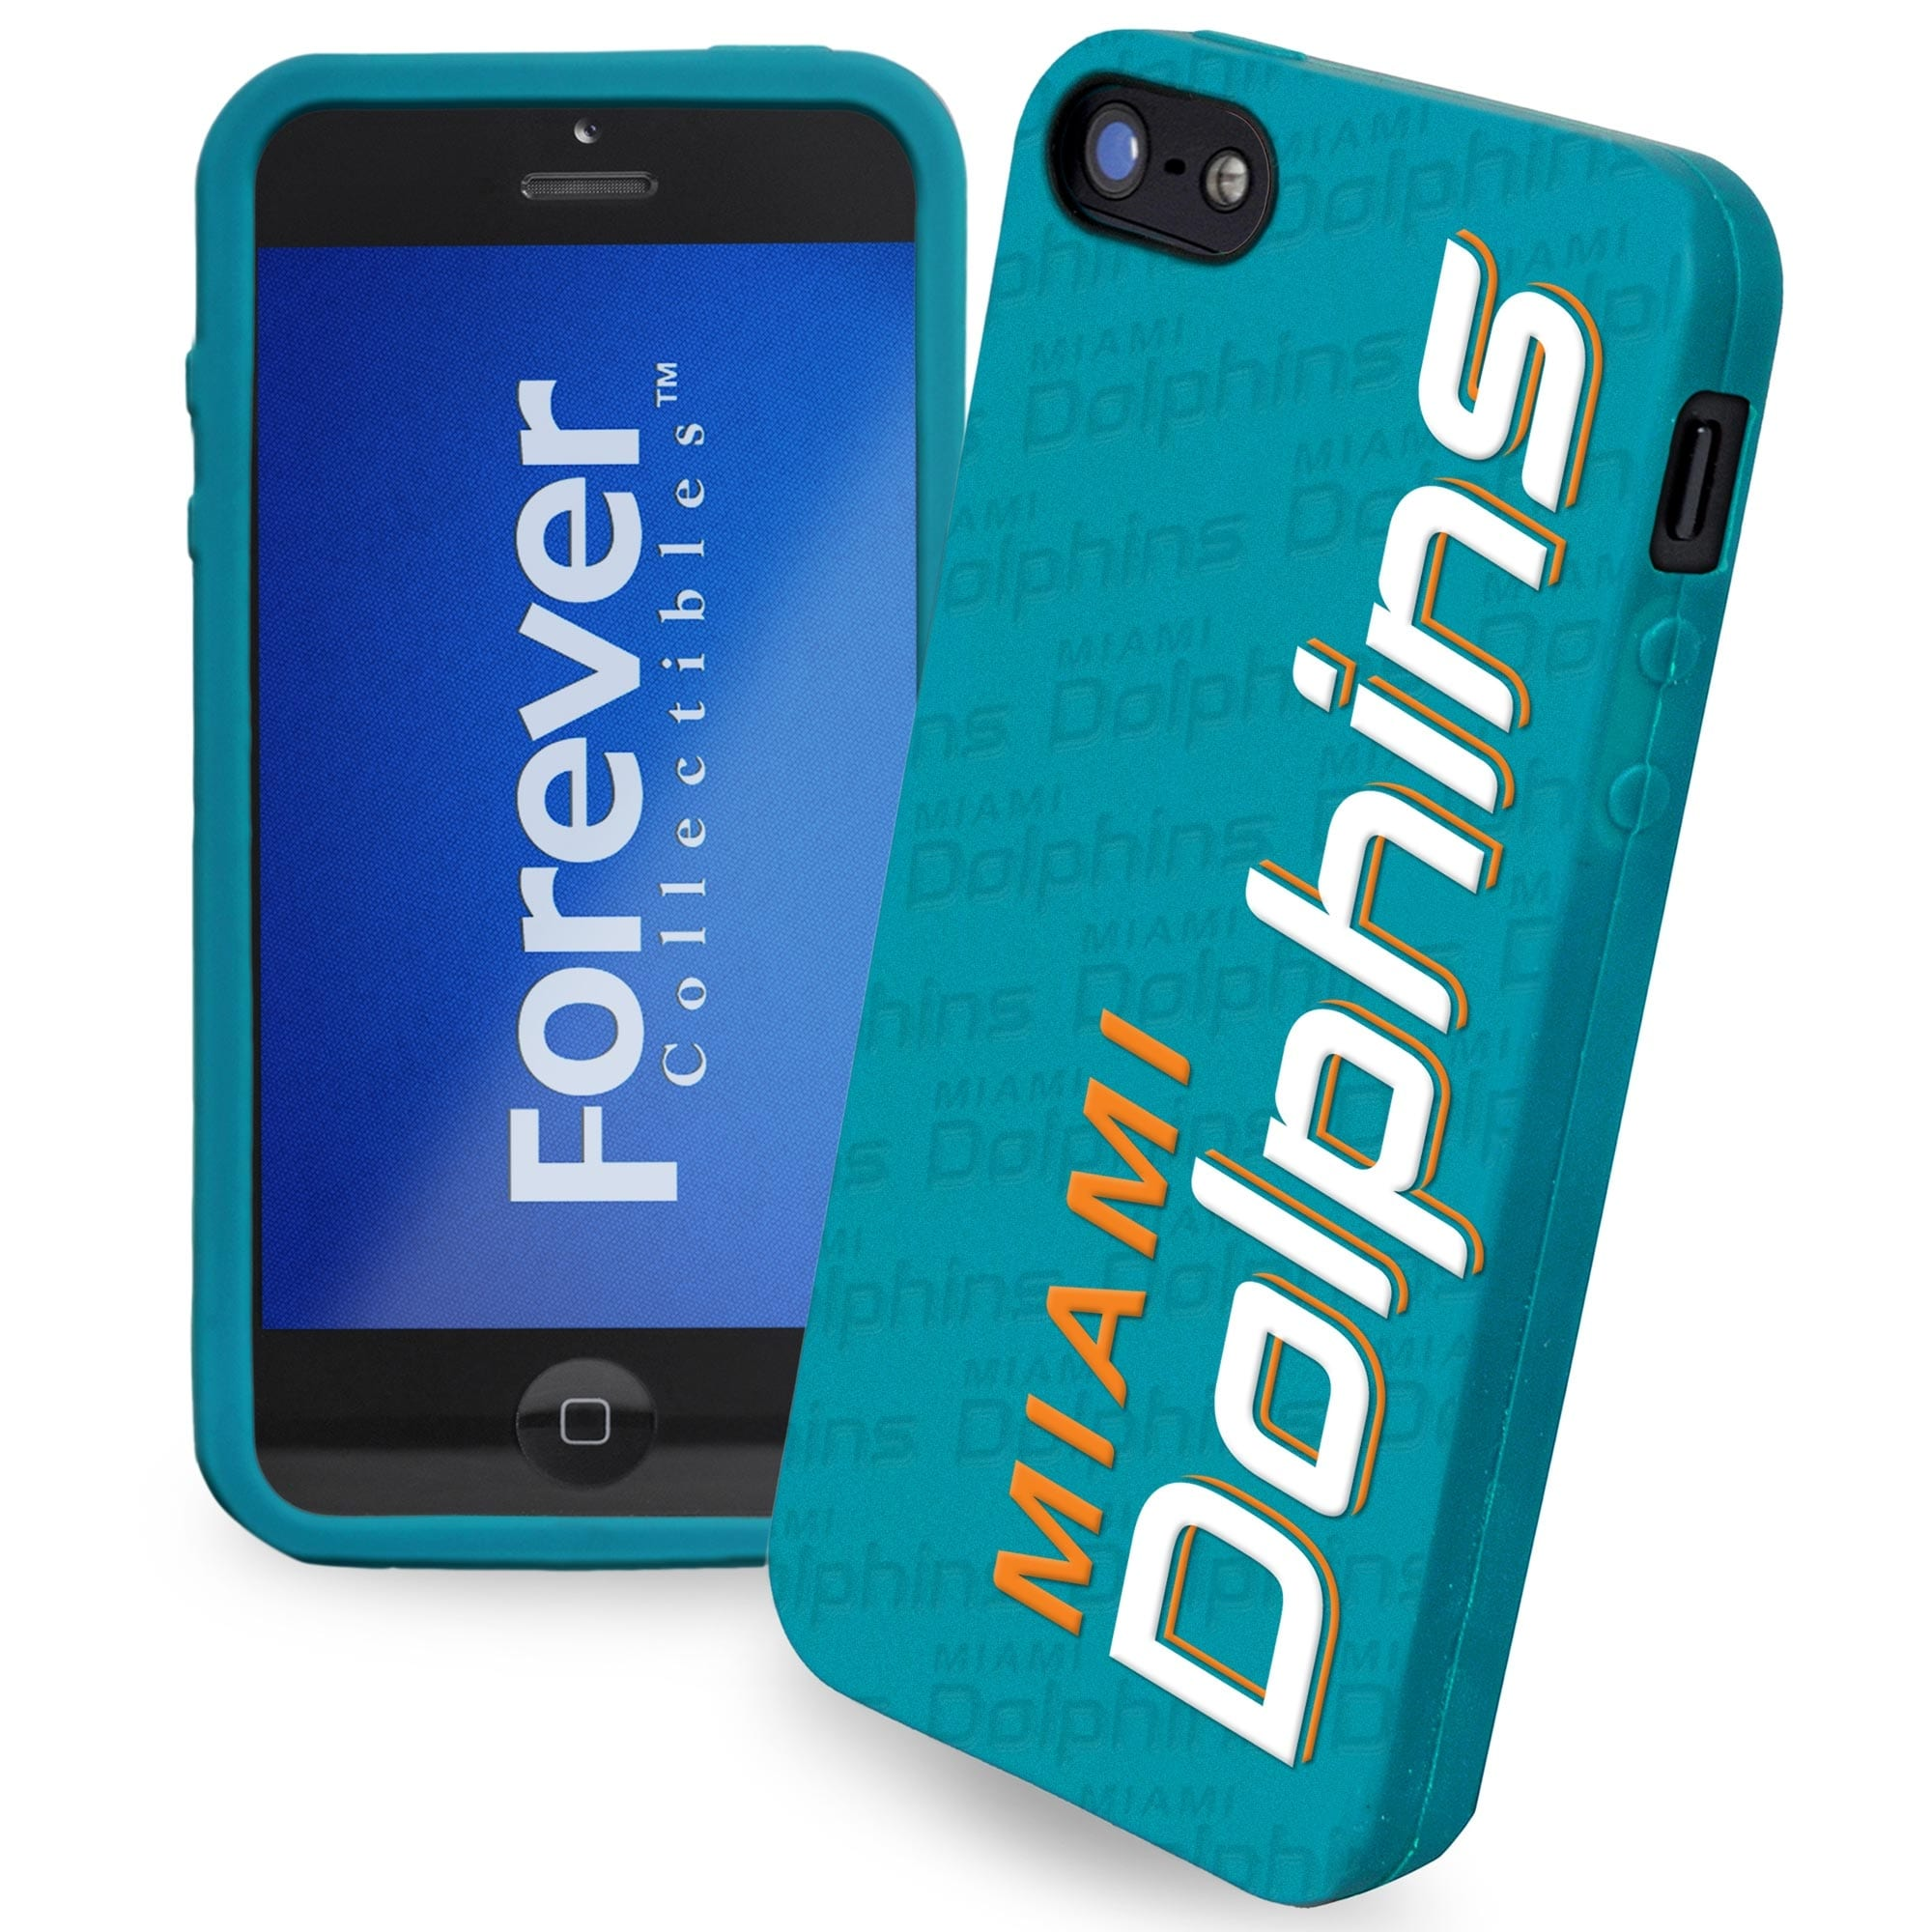 Miami Dolphins Silicone iPhone 5 Cover - Aqua